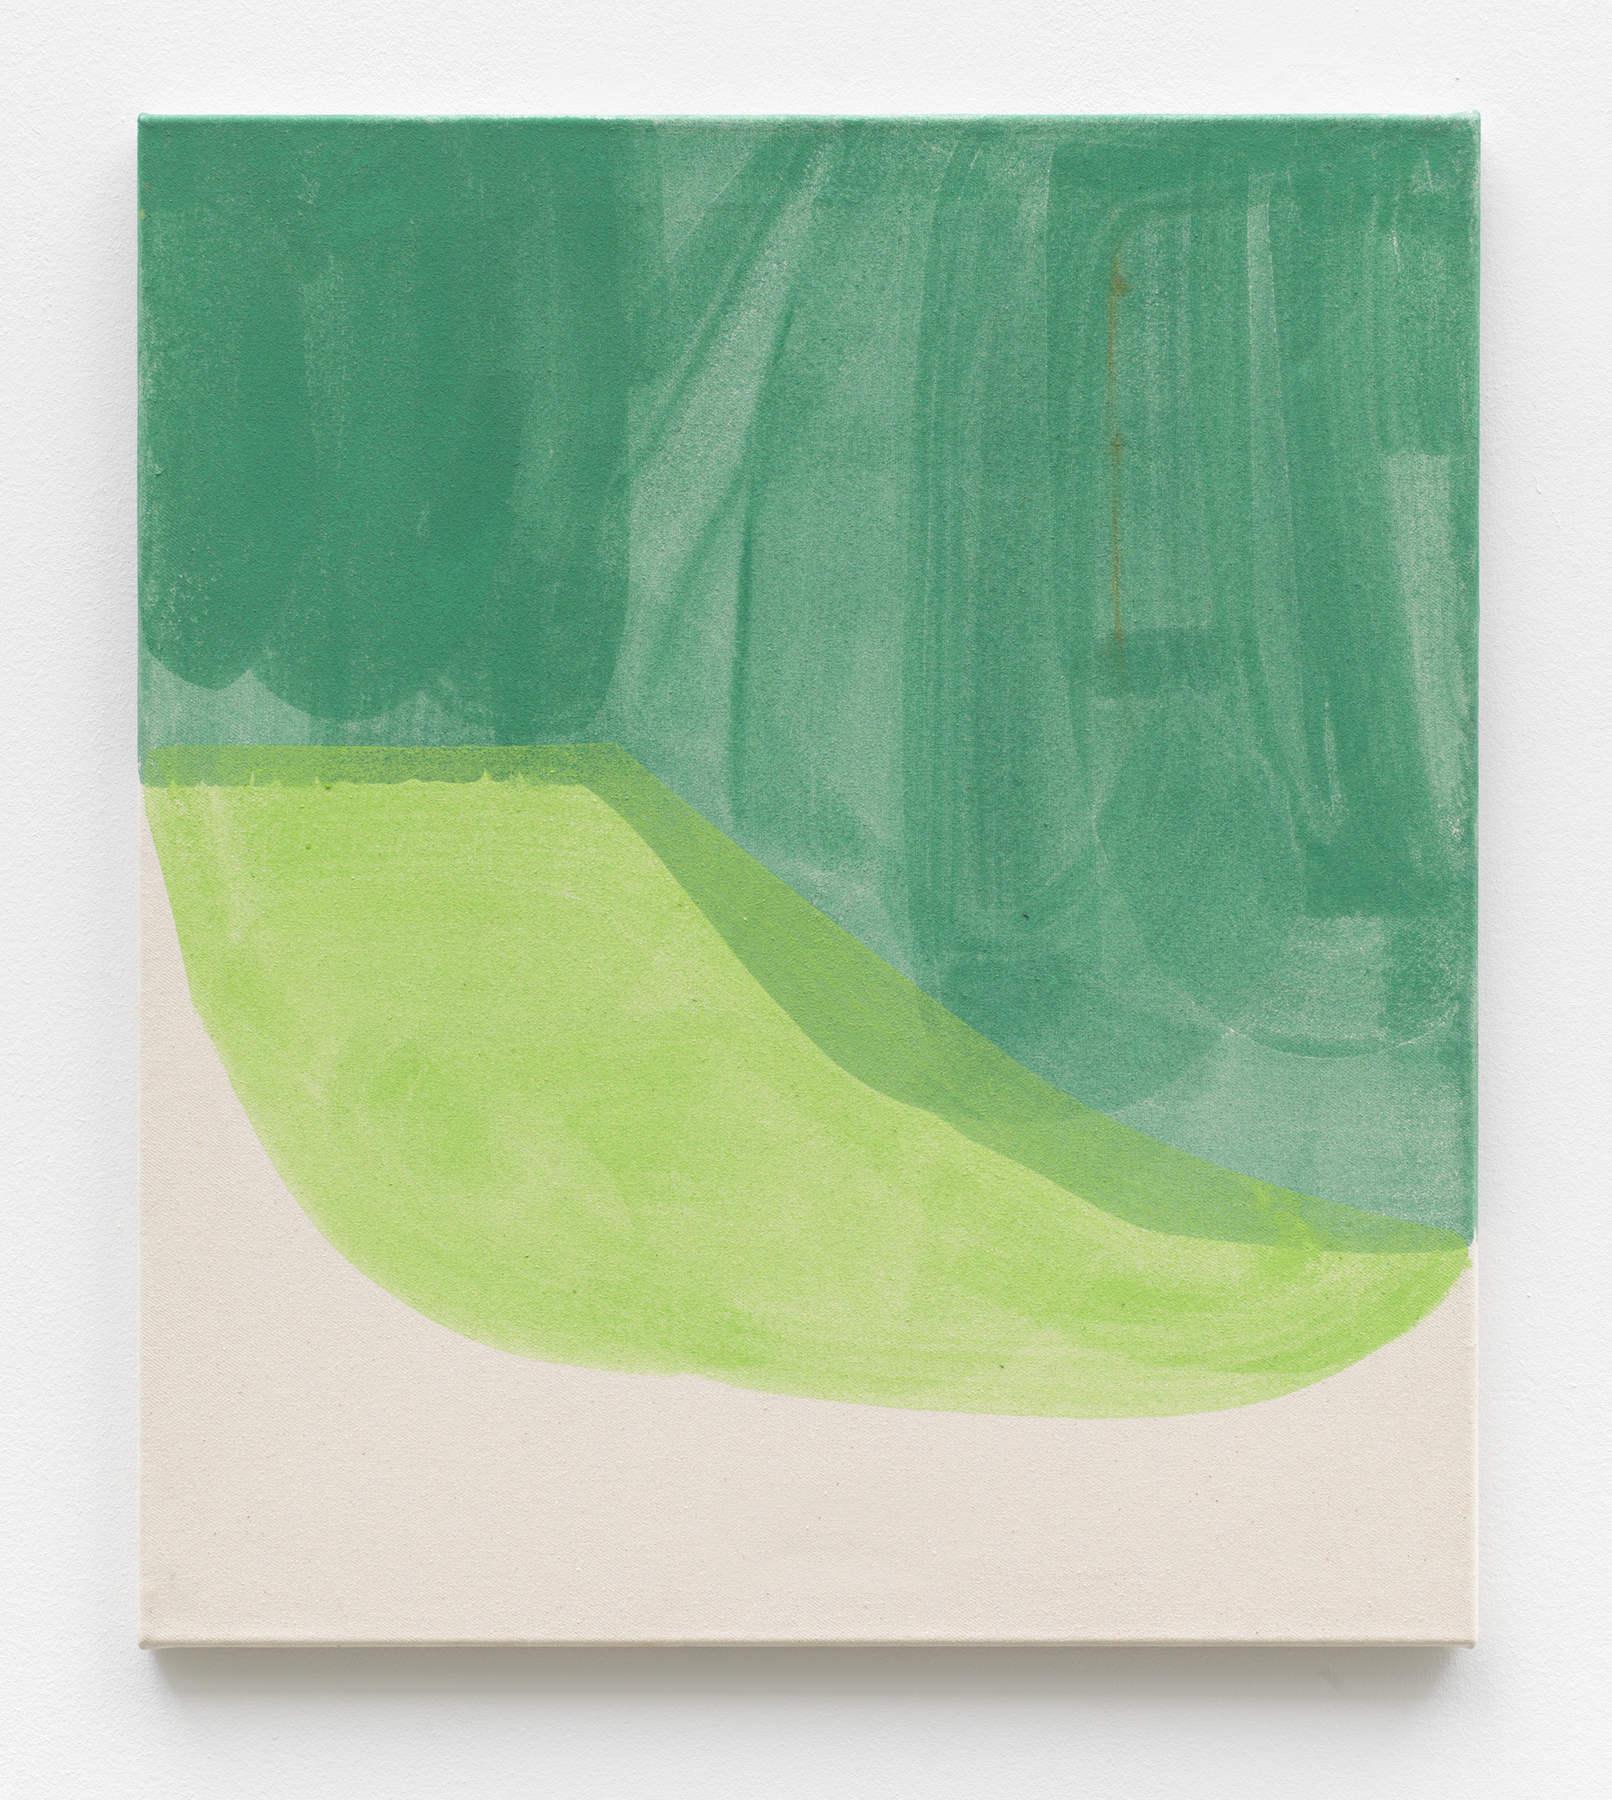 Amadyar_2016_frühschicht_Galerie Guido W. Baudach, Berlin